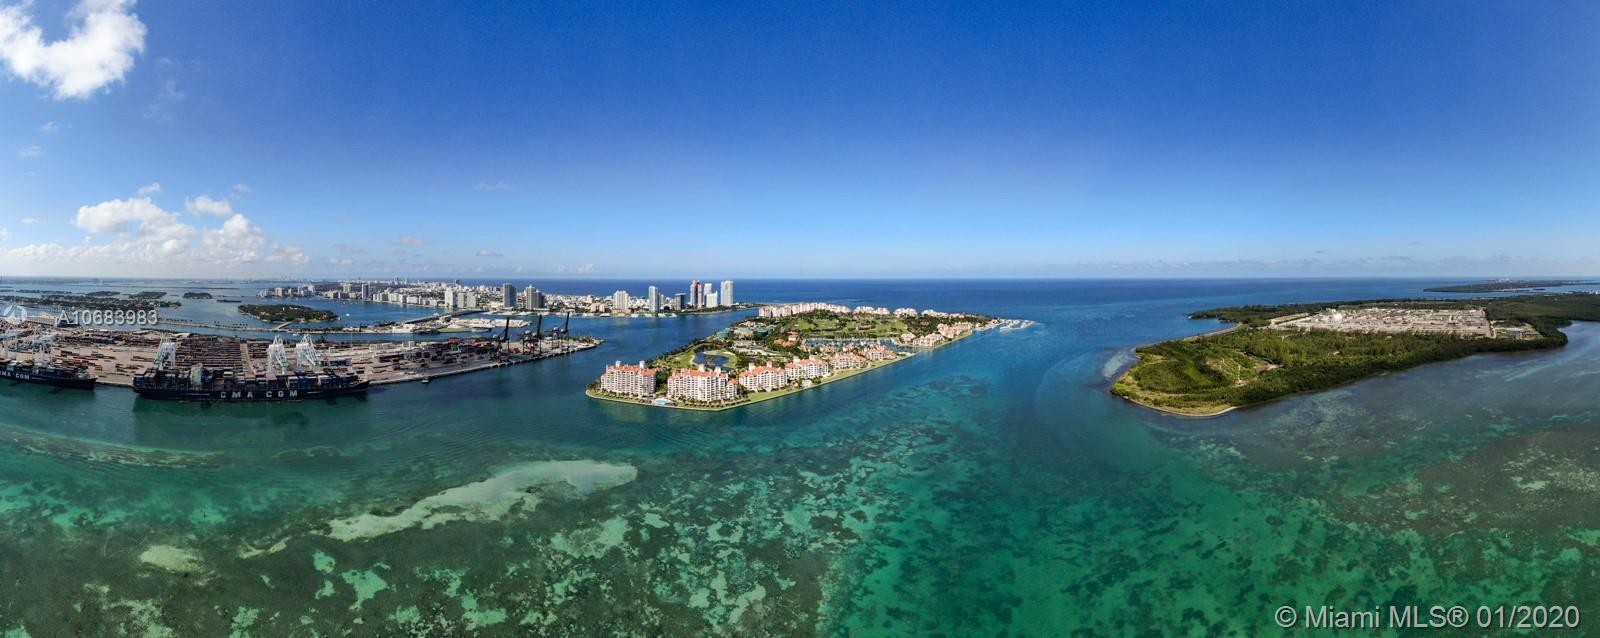 5112 Fisher island dr-5112 miami-beach-fl-33109-a10683983-Pic46